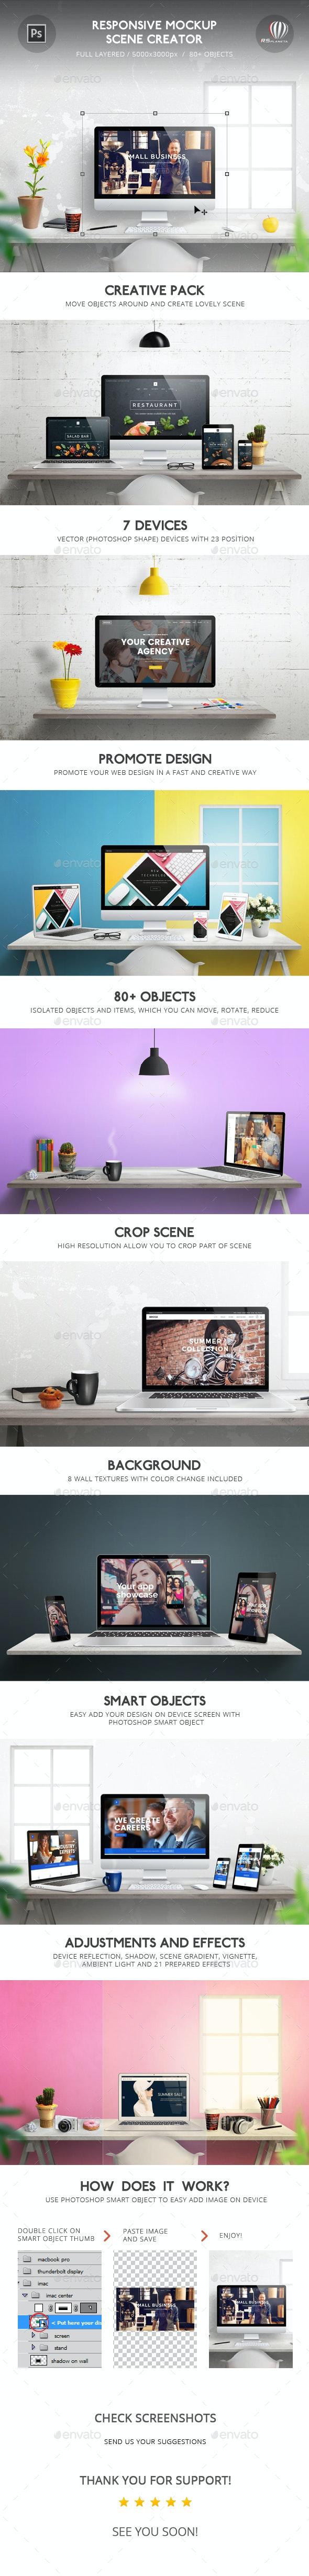 Responsive Mockup Scene Creator - Displays Product Mock-Ups